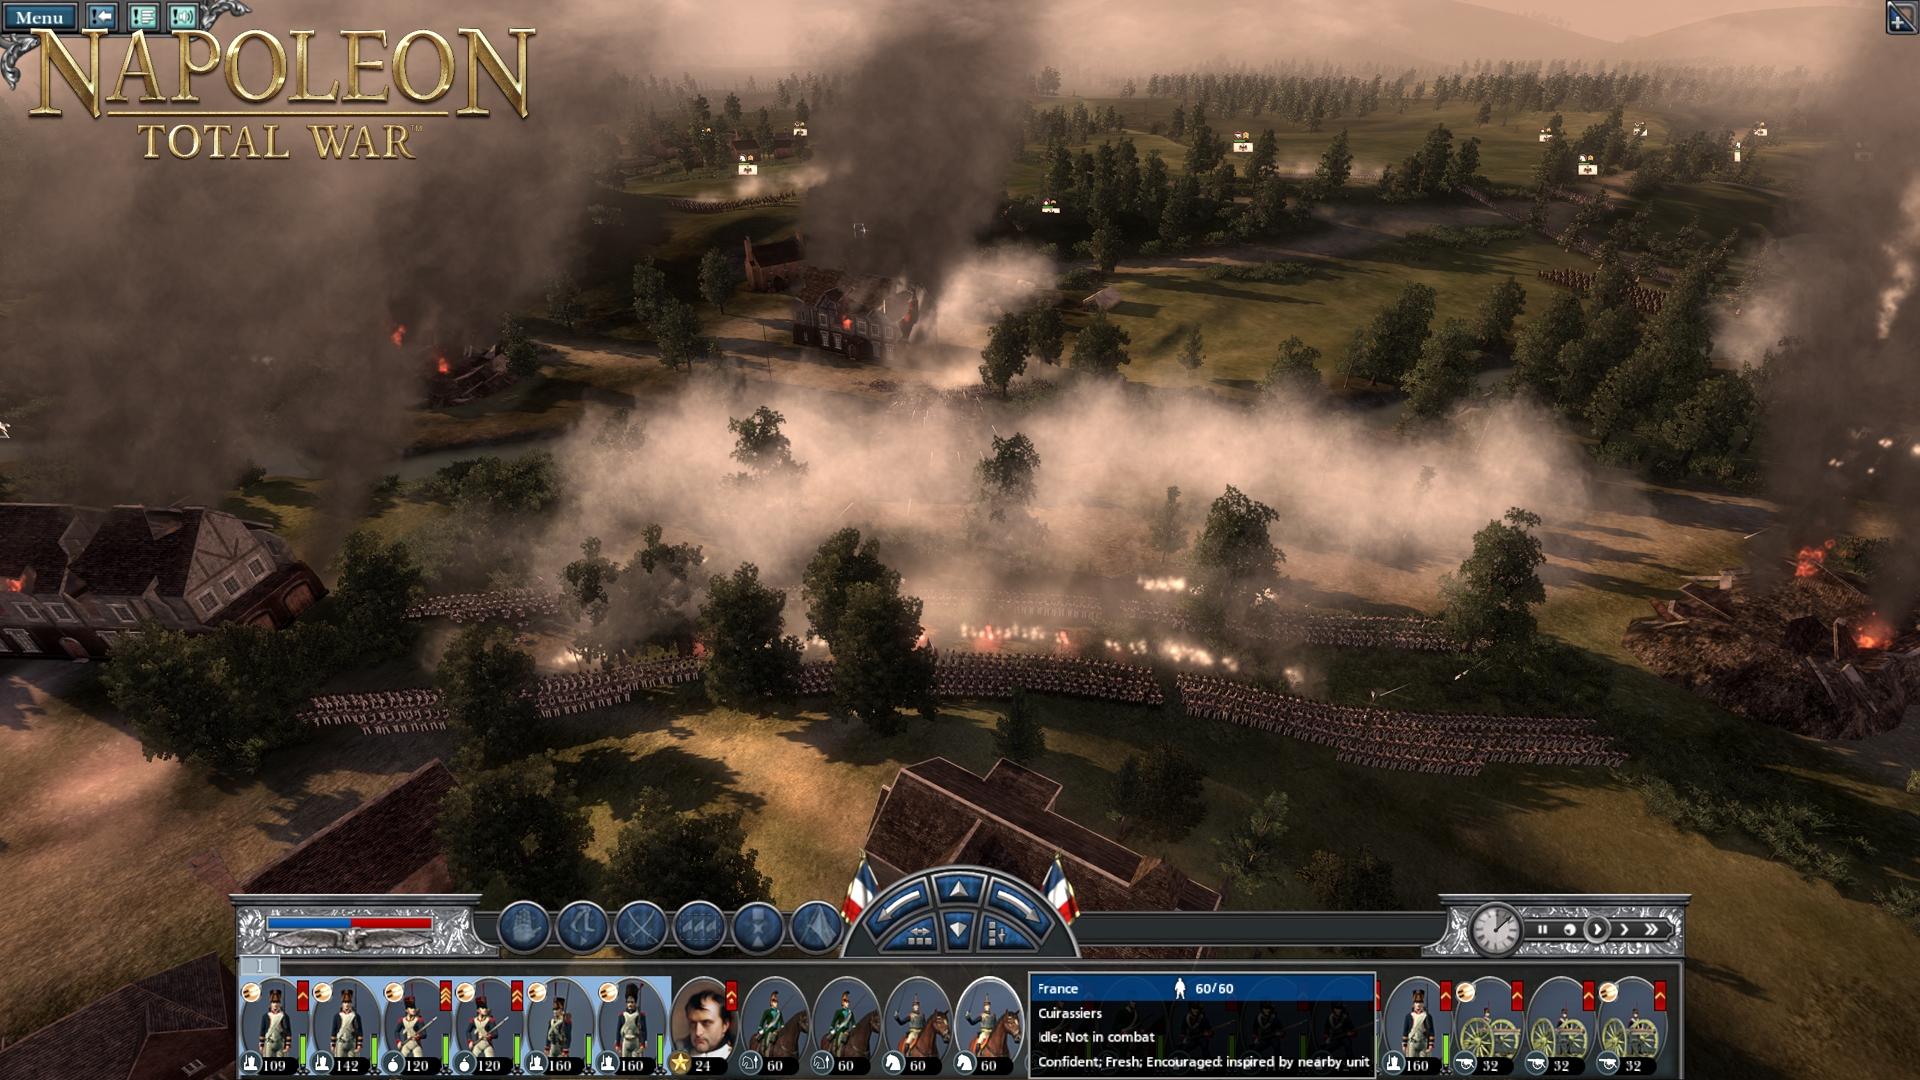 Napoleon Total War 1494284 Hd Wallpaper Backgrounds